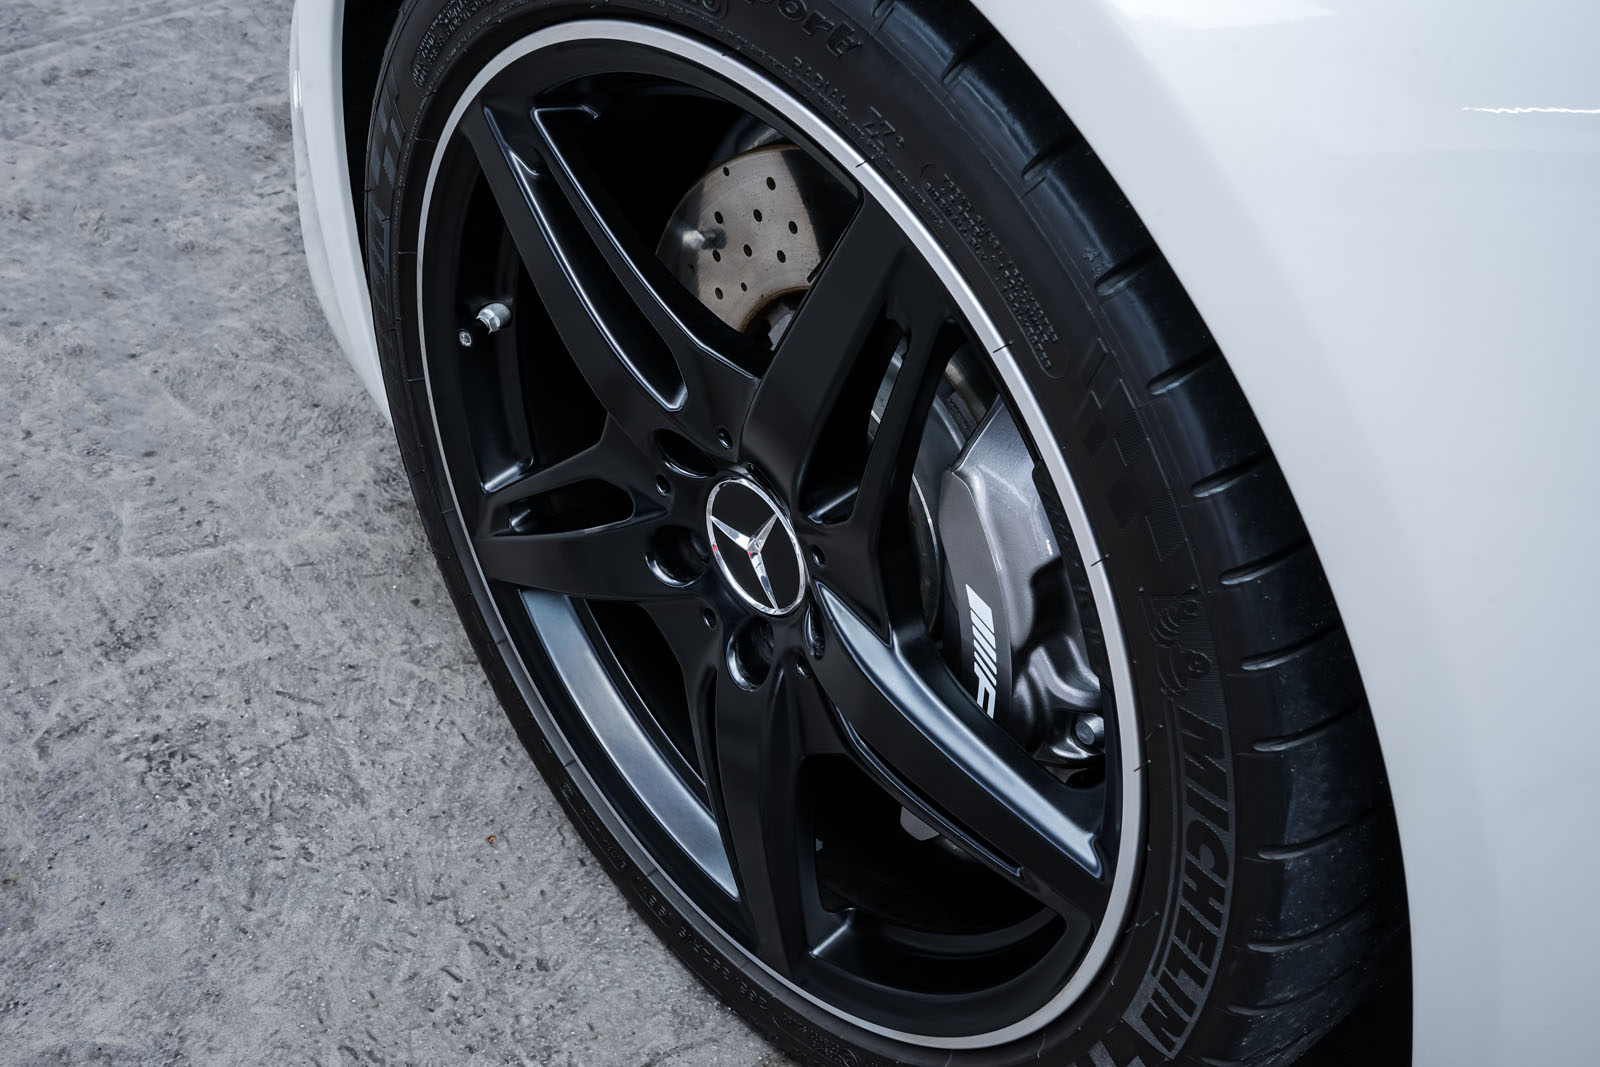 11Mercedes_Benz_AMG_GT_Roadster_Weiss_Schwarz_MB-9710_14_w